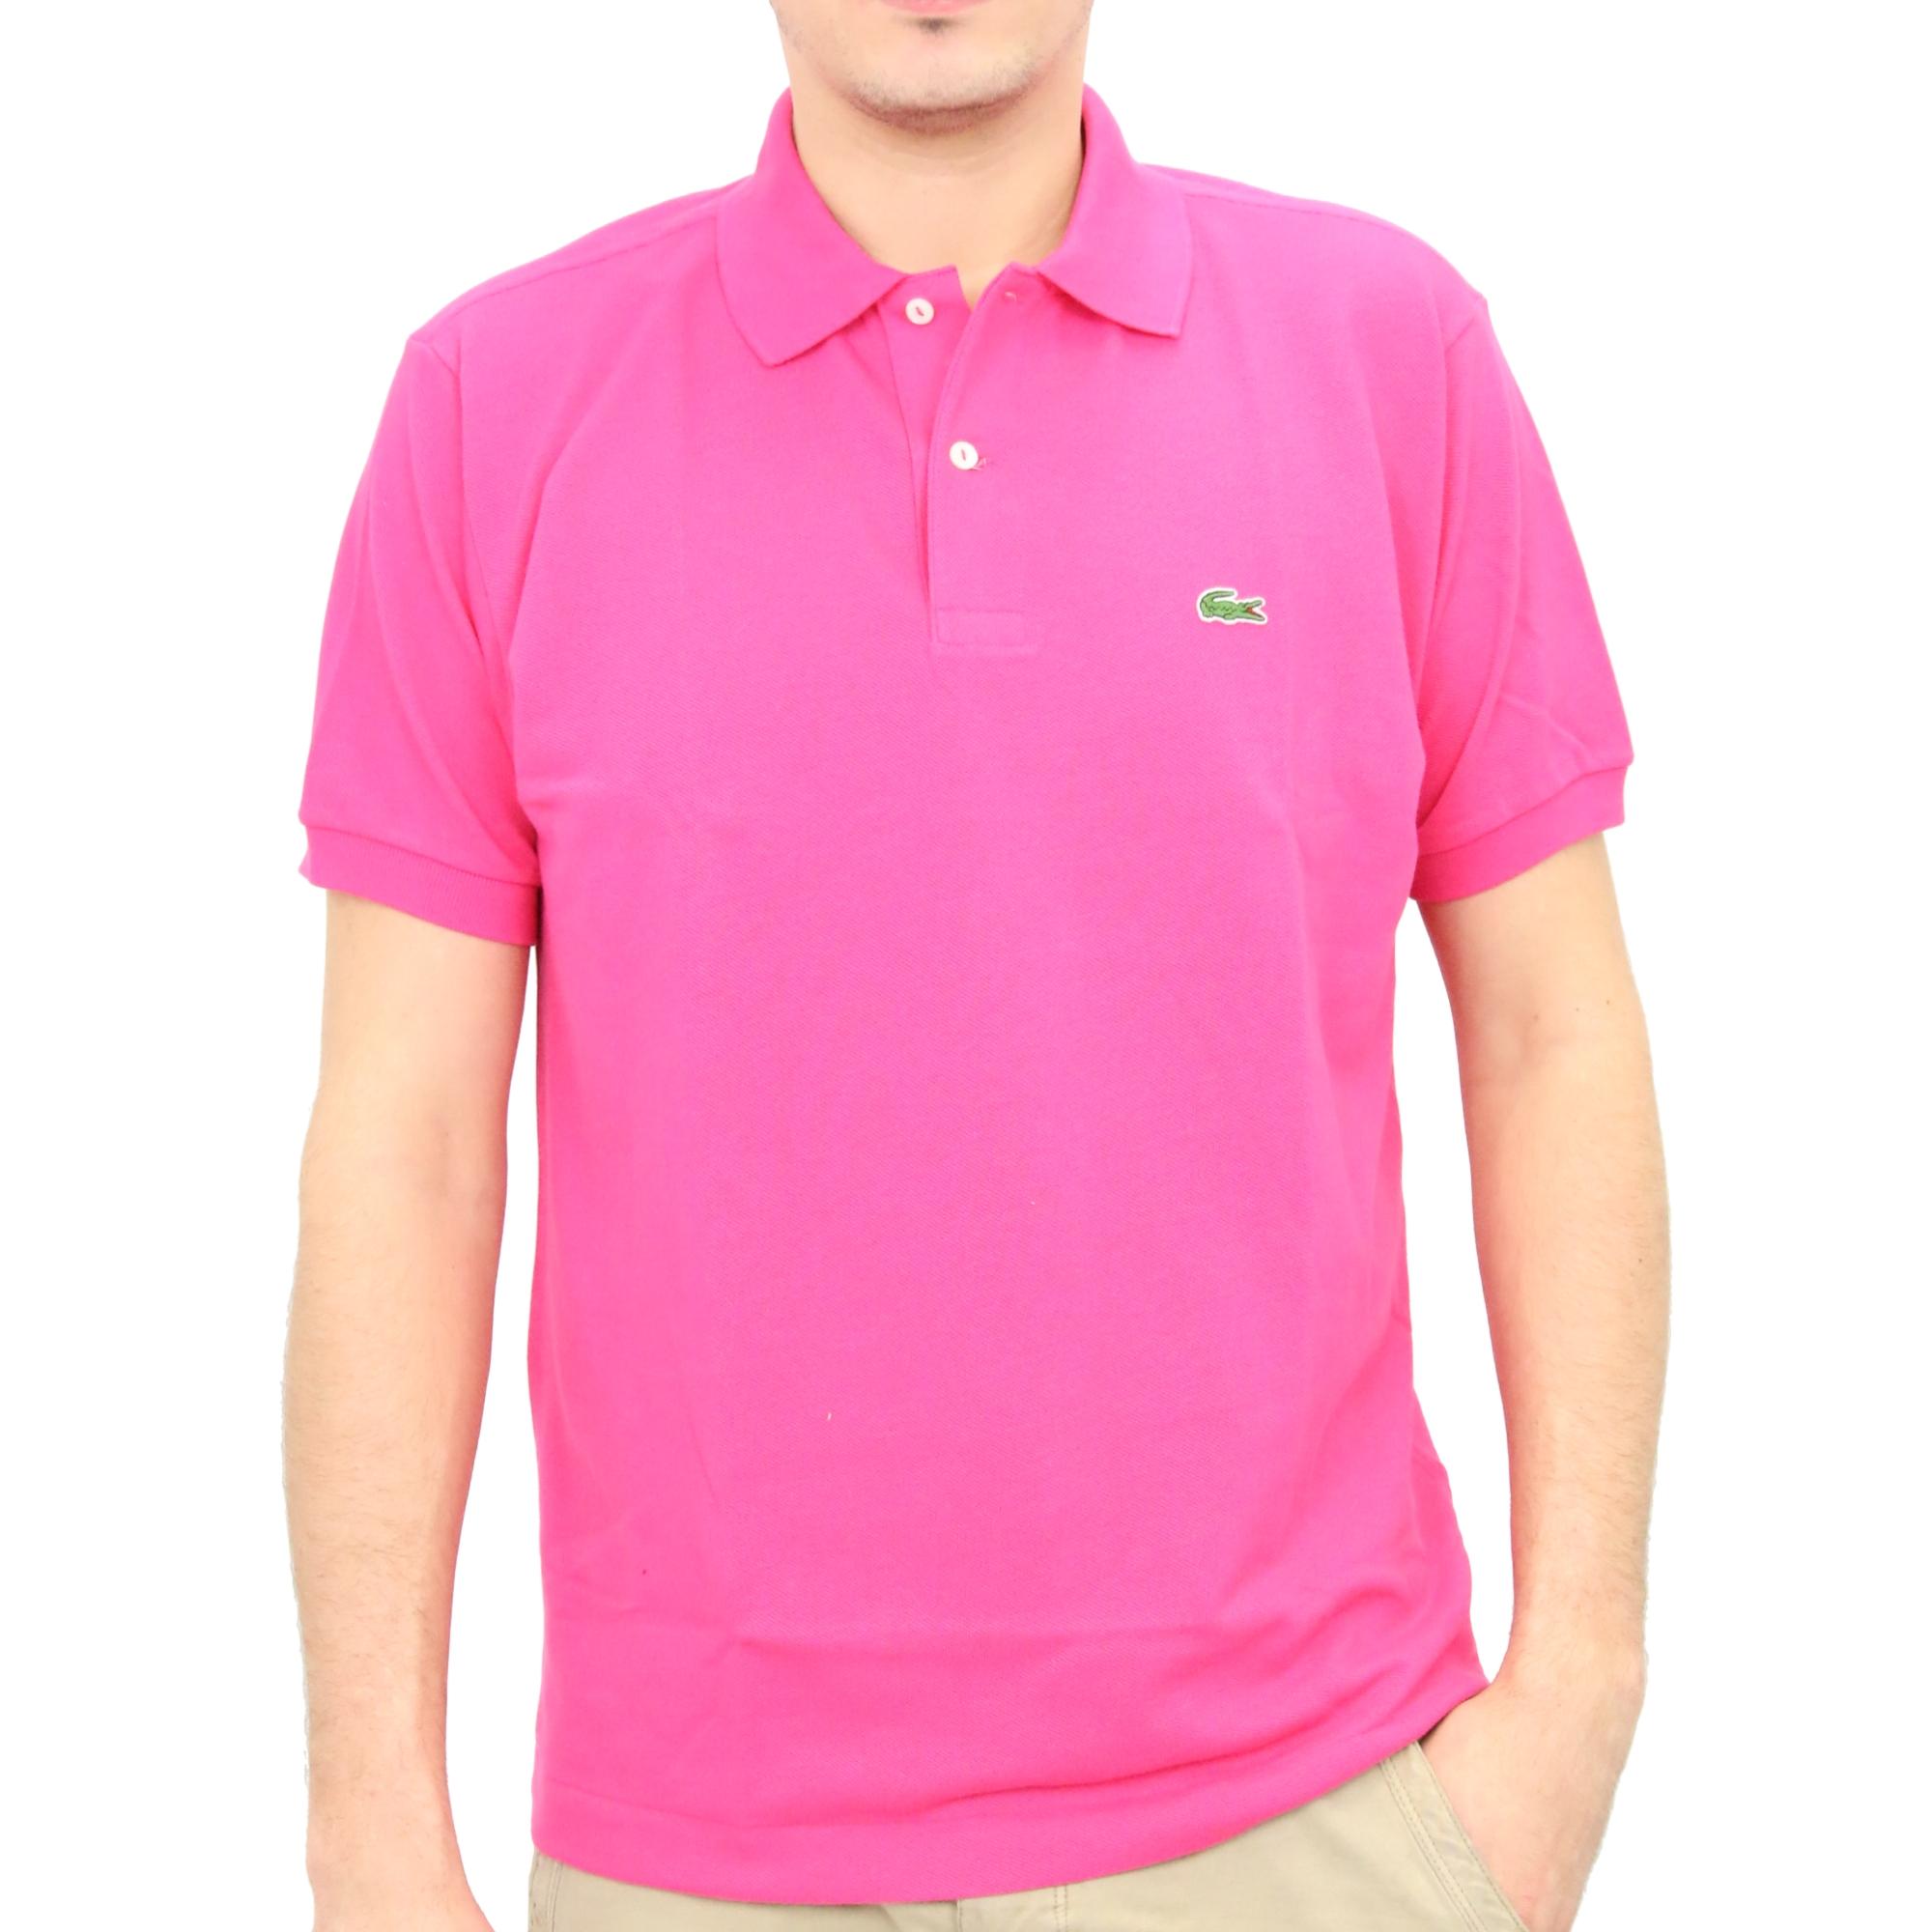 Lacoste L.12.12 Original Polo Shirt Polohemd diverse